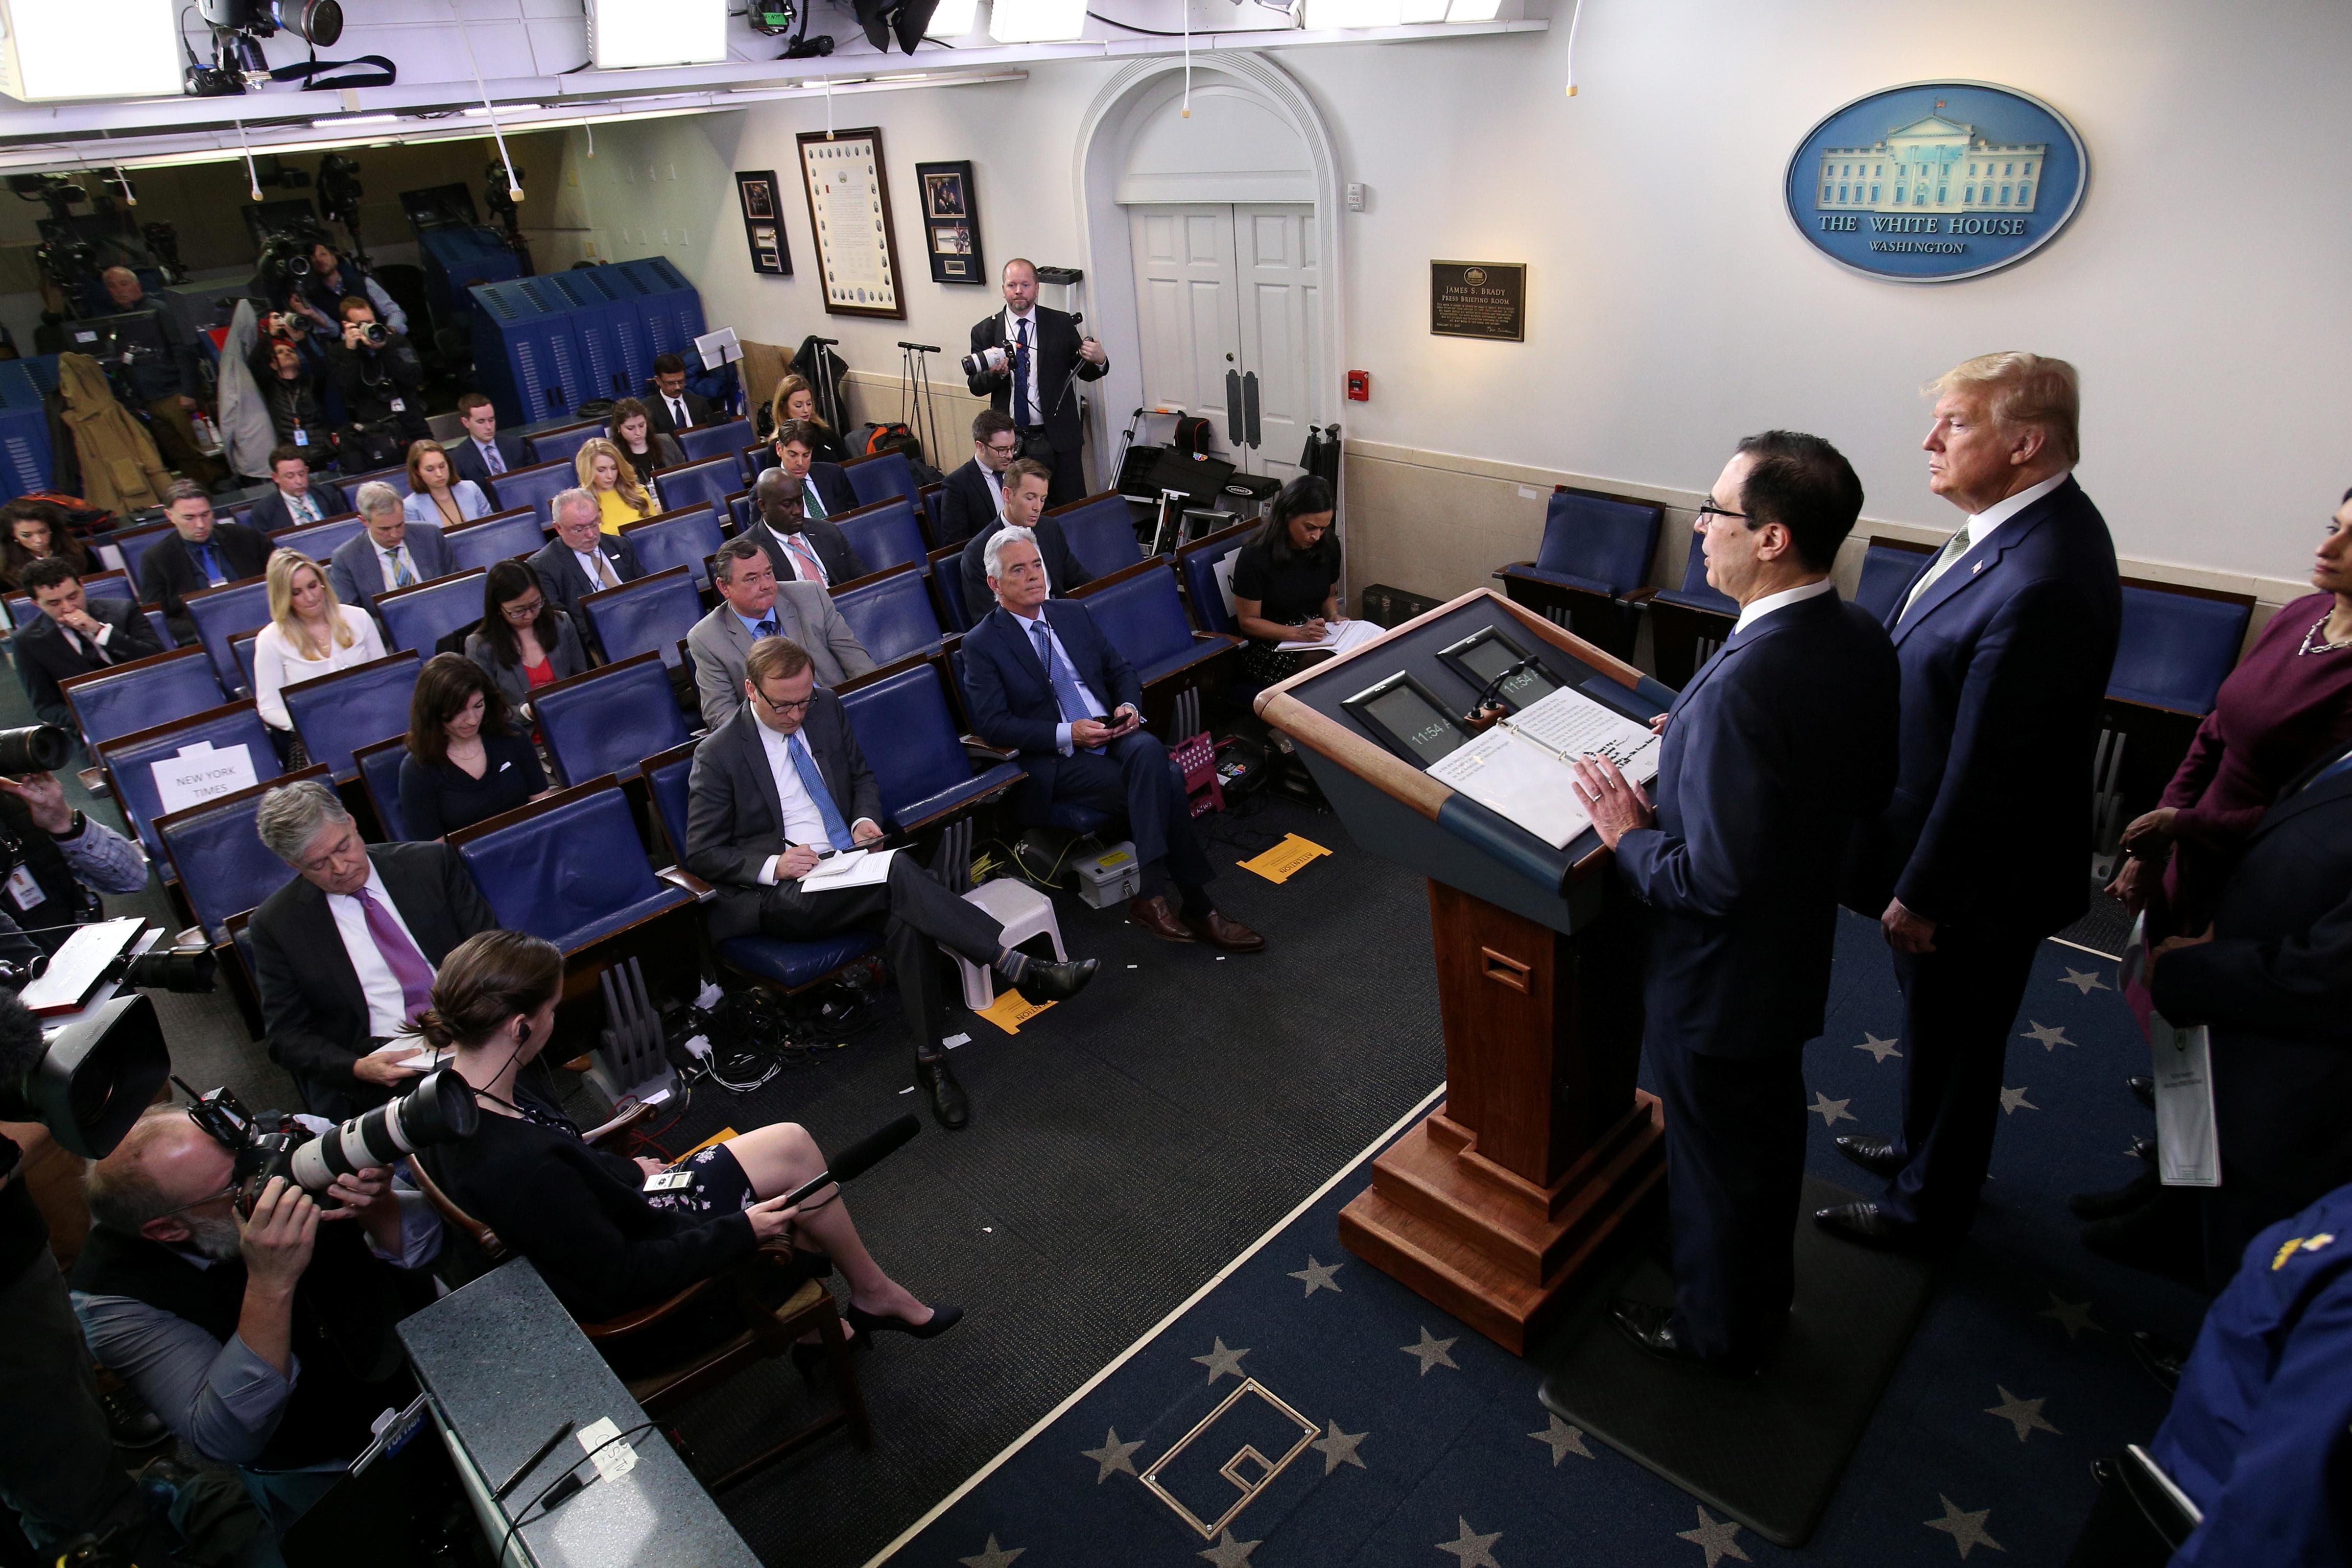 U.S. President Donald Trump looks on as Treasury Secretary Steven Mnuchin addresses the daily coronavirus (COVID-19) briefing at the White House in Washington, U.S., March 17, 2020. REUTERS/Jonathan Ernst